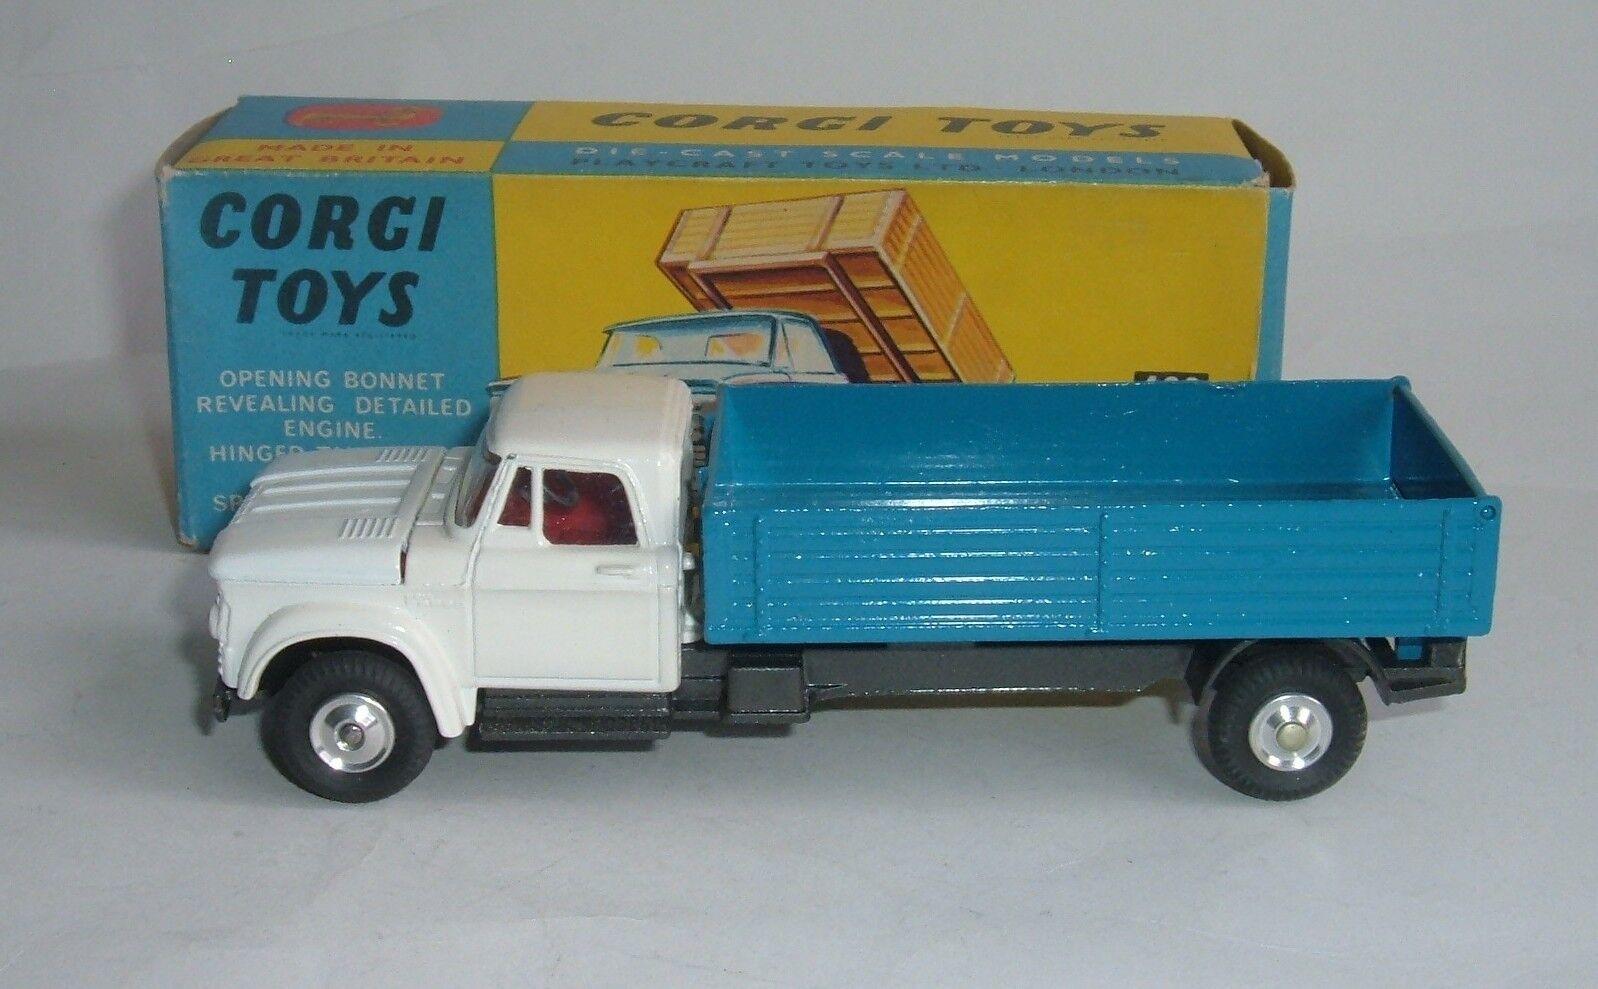 Corgi Toys Nº 483, Dodge 'Kew Fargo' volquete, - Excelente